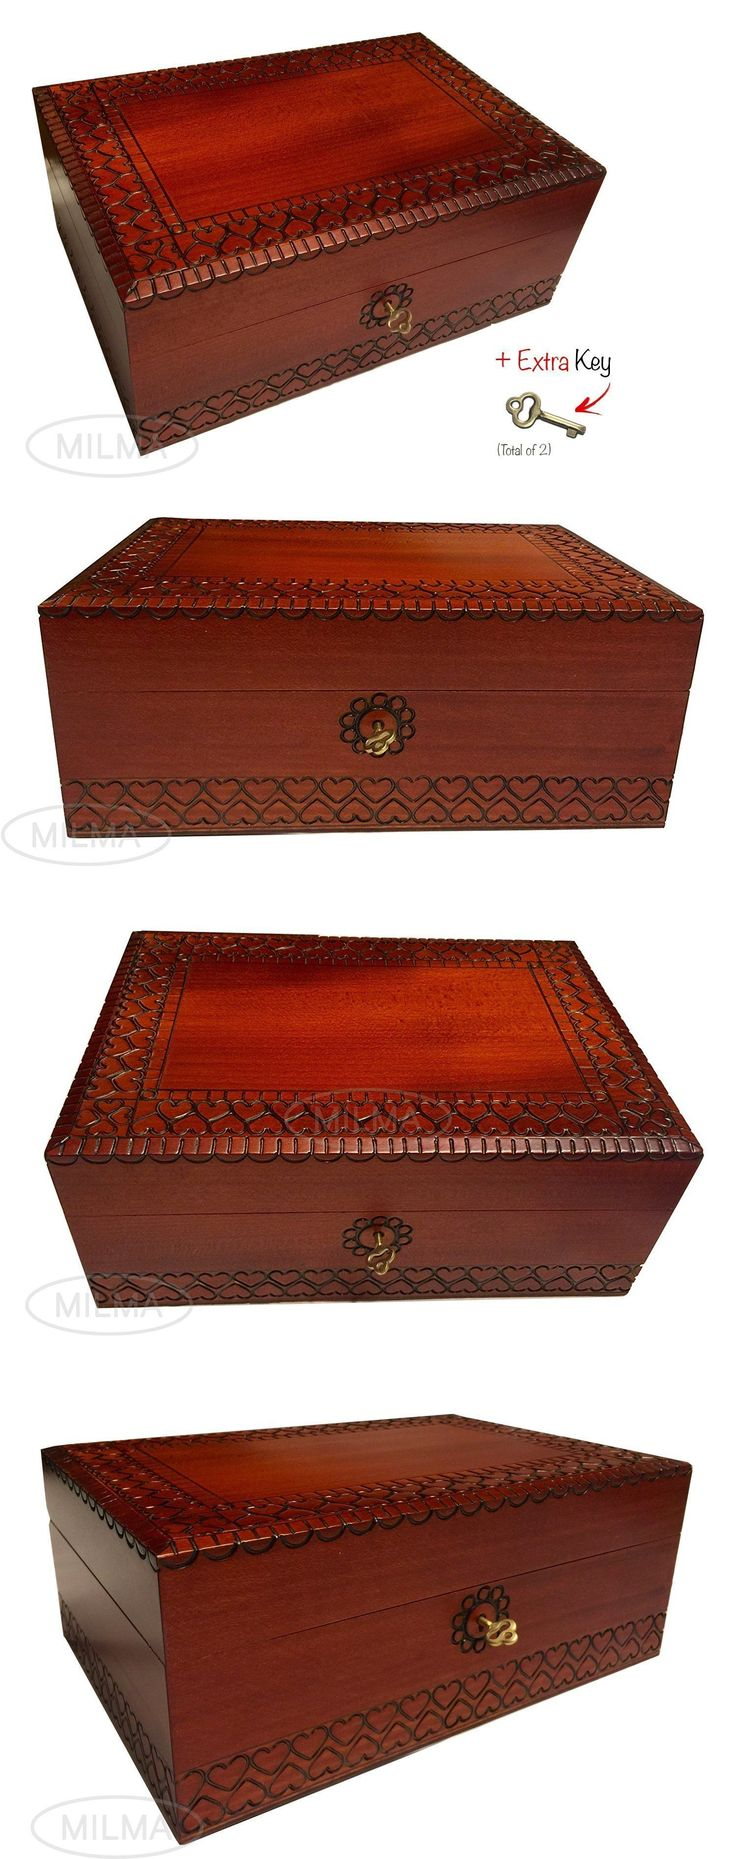 jewelry boxes extra large wood box polish handmade wooden jewelry box keepsake lock and - Wood Jewelry Box